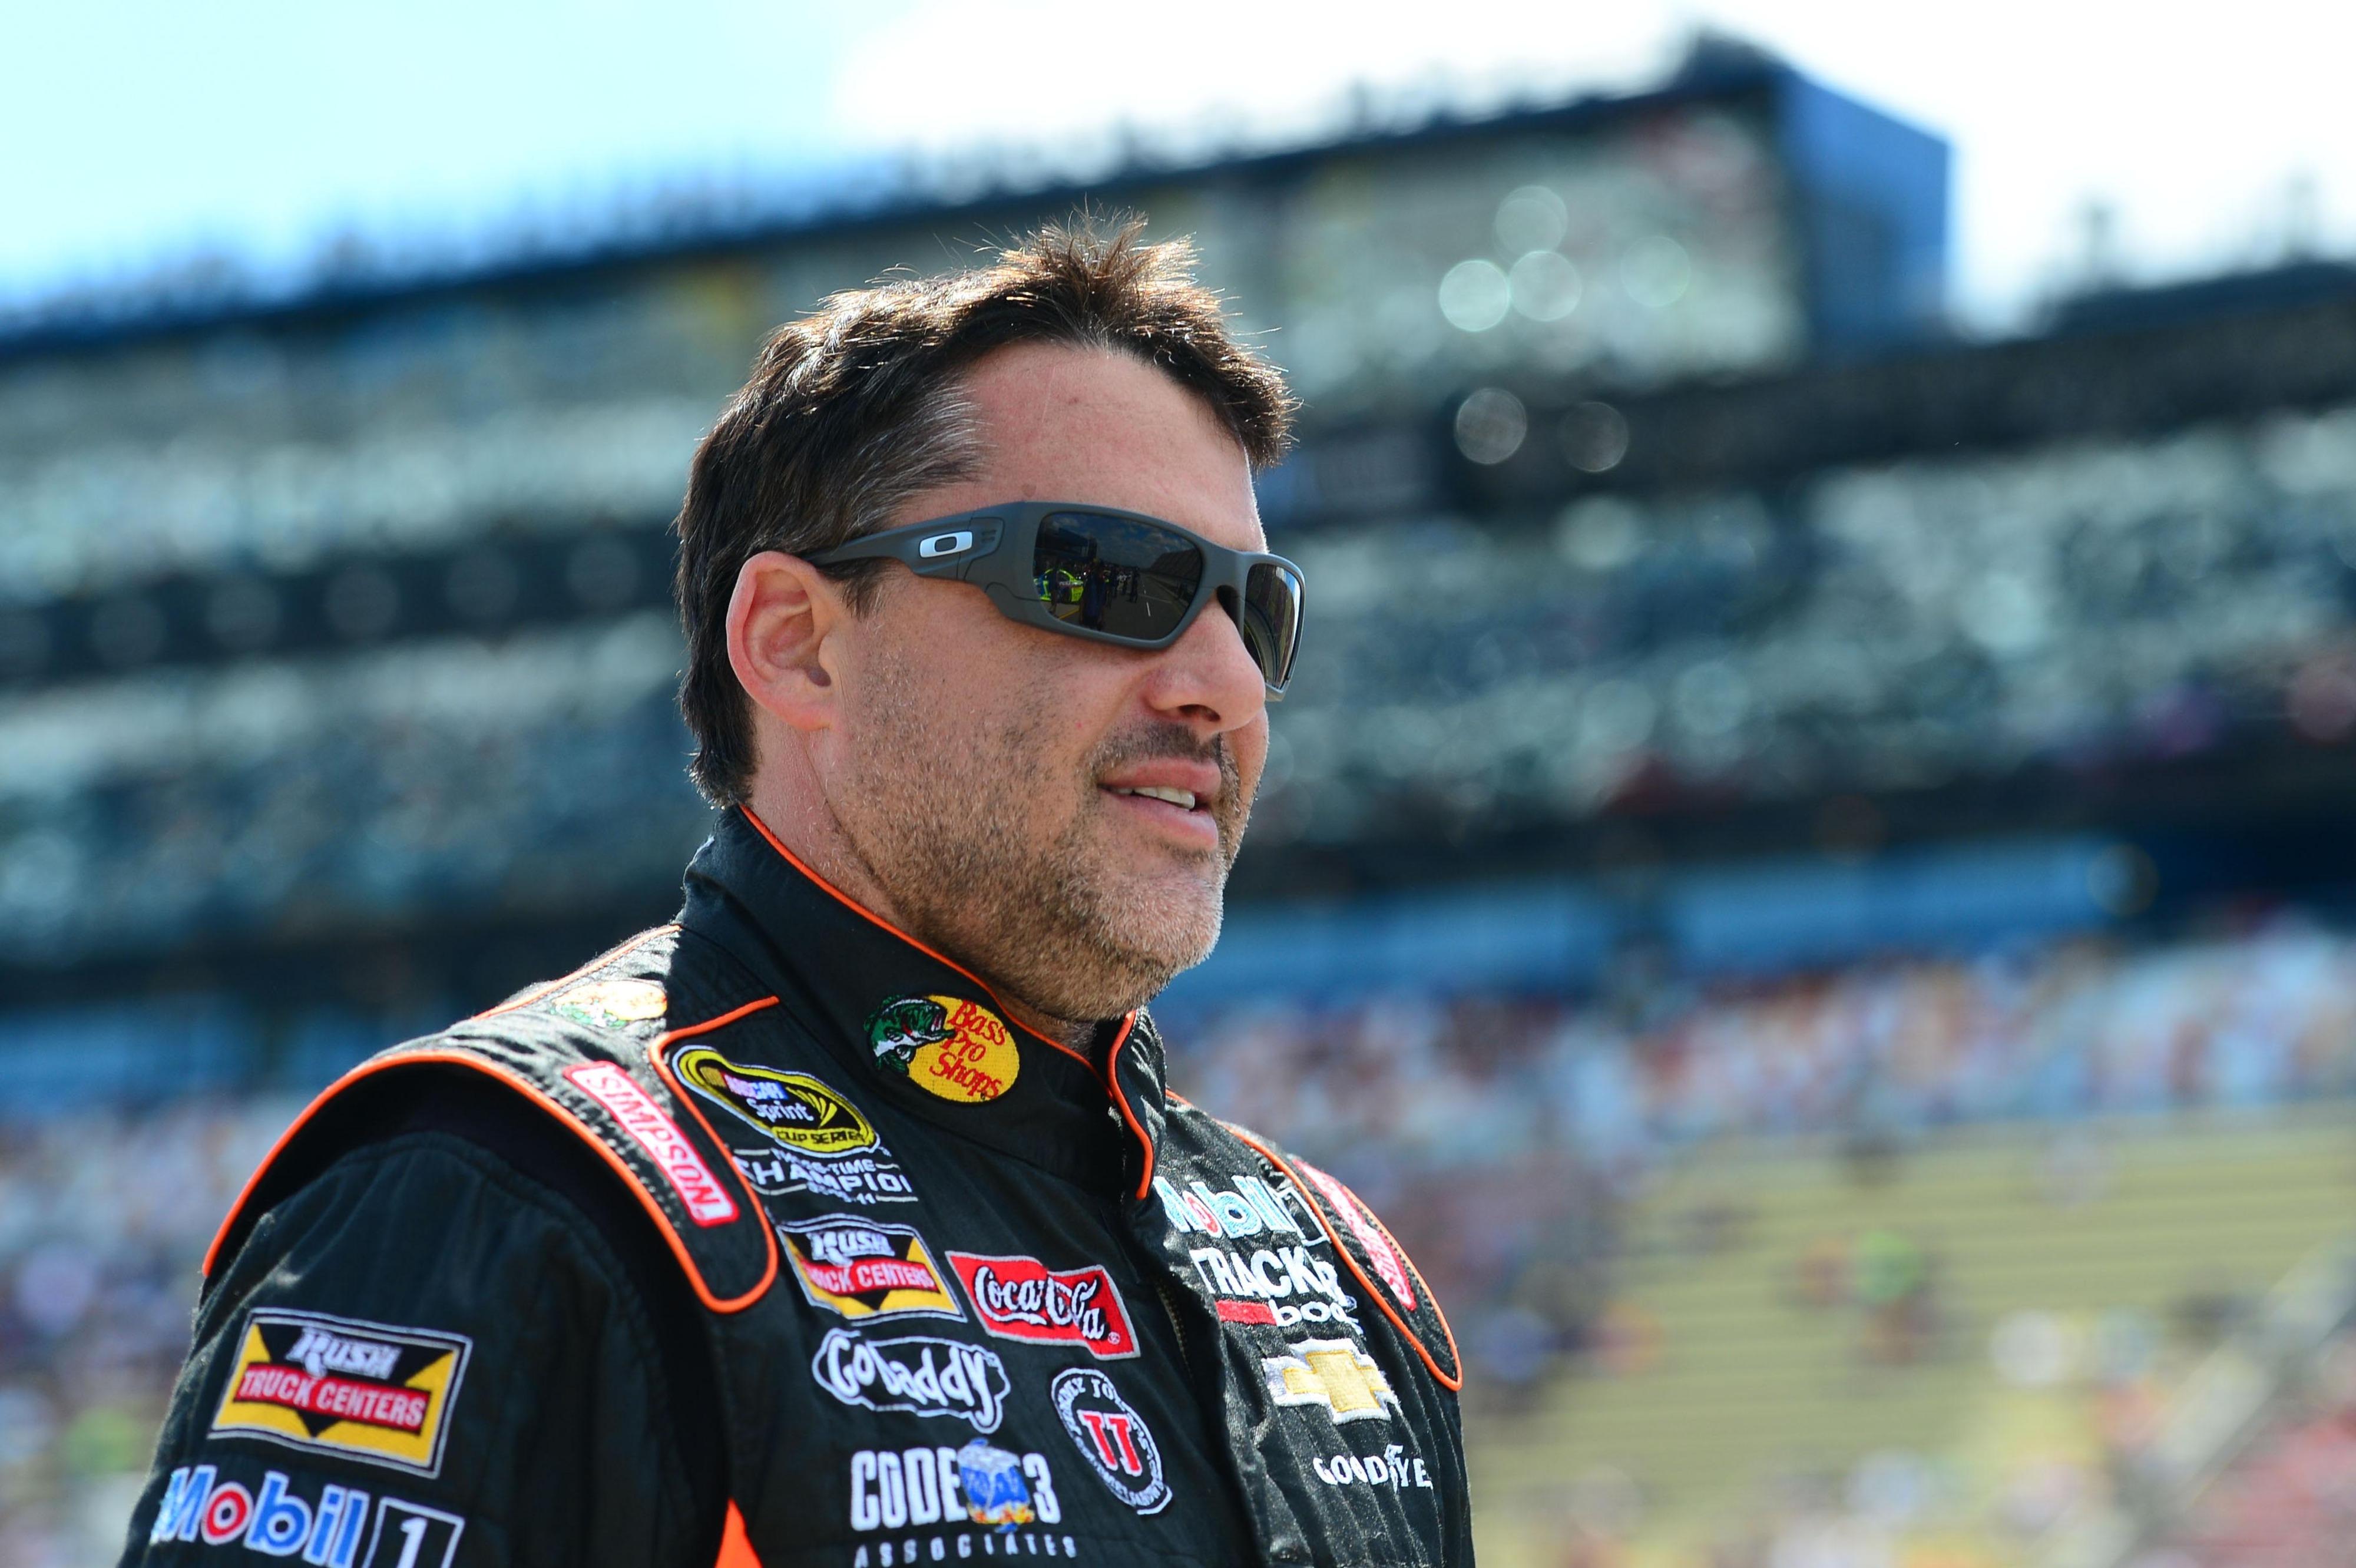 NASCAR Sonoma 2014: Tony Stewart warns Kyle Larson about blocking